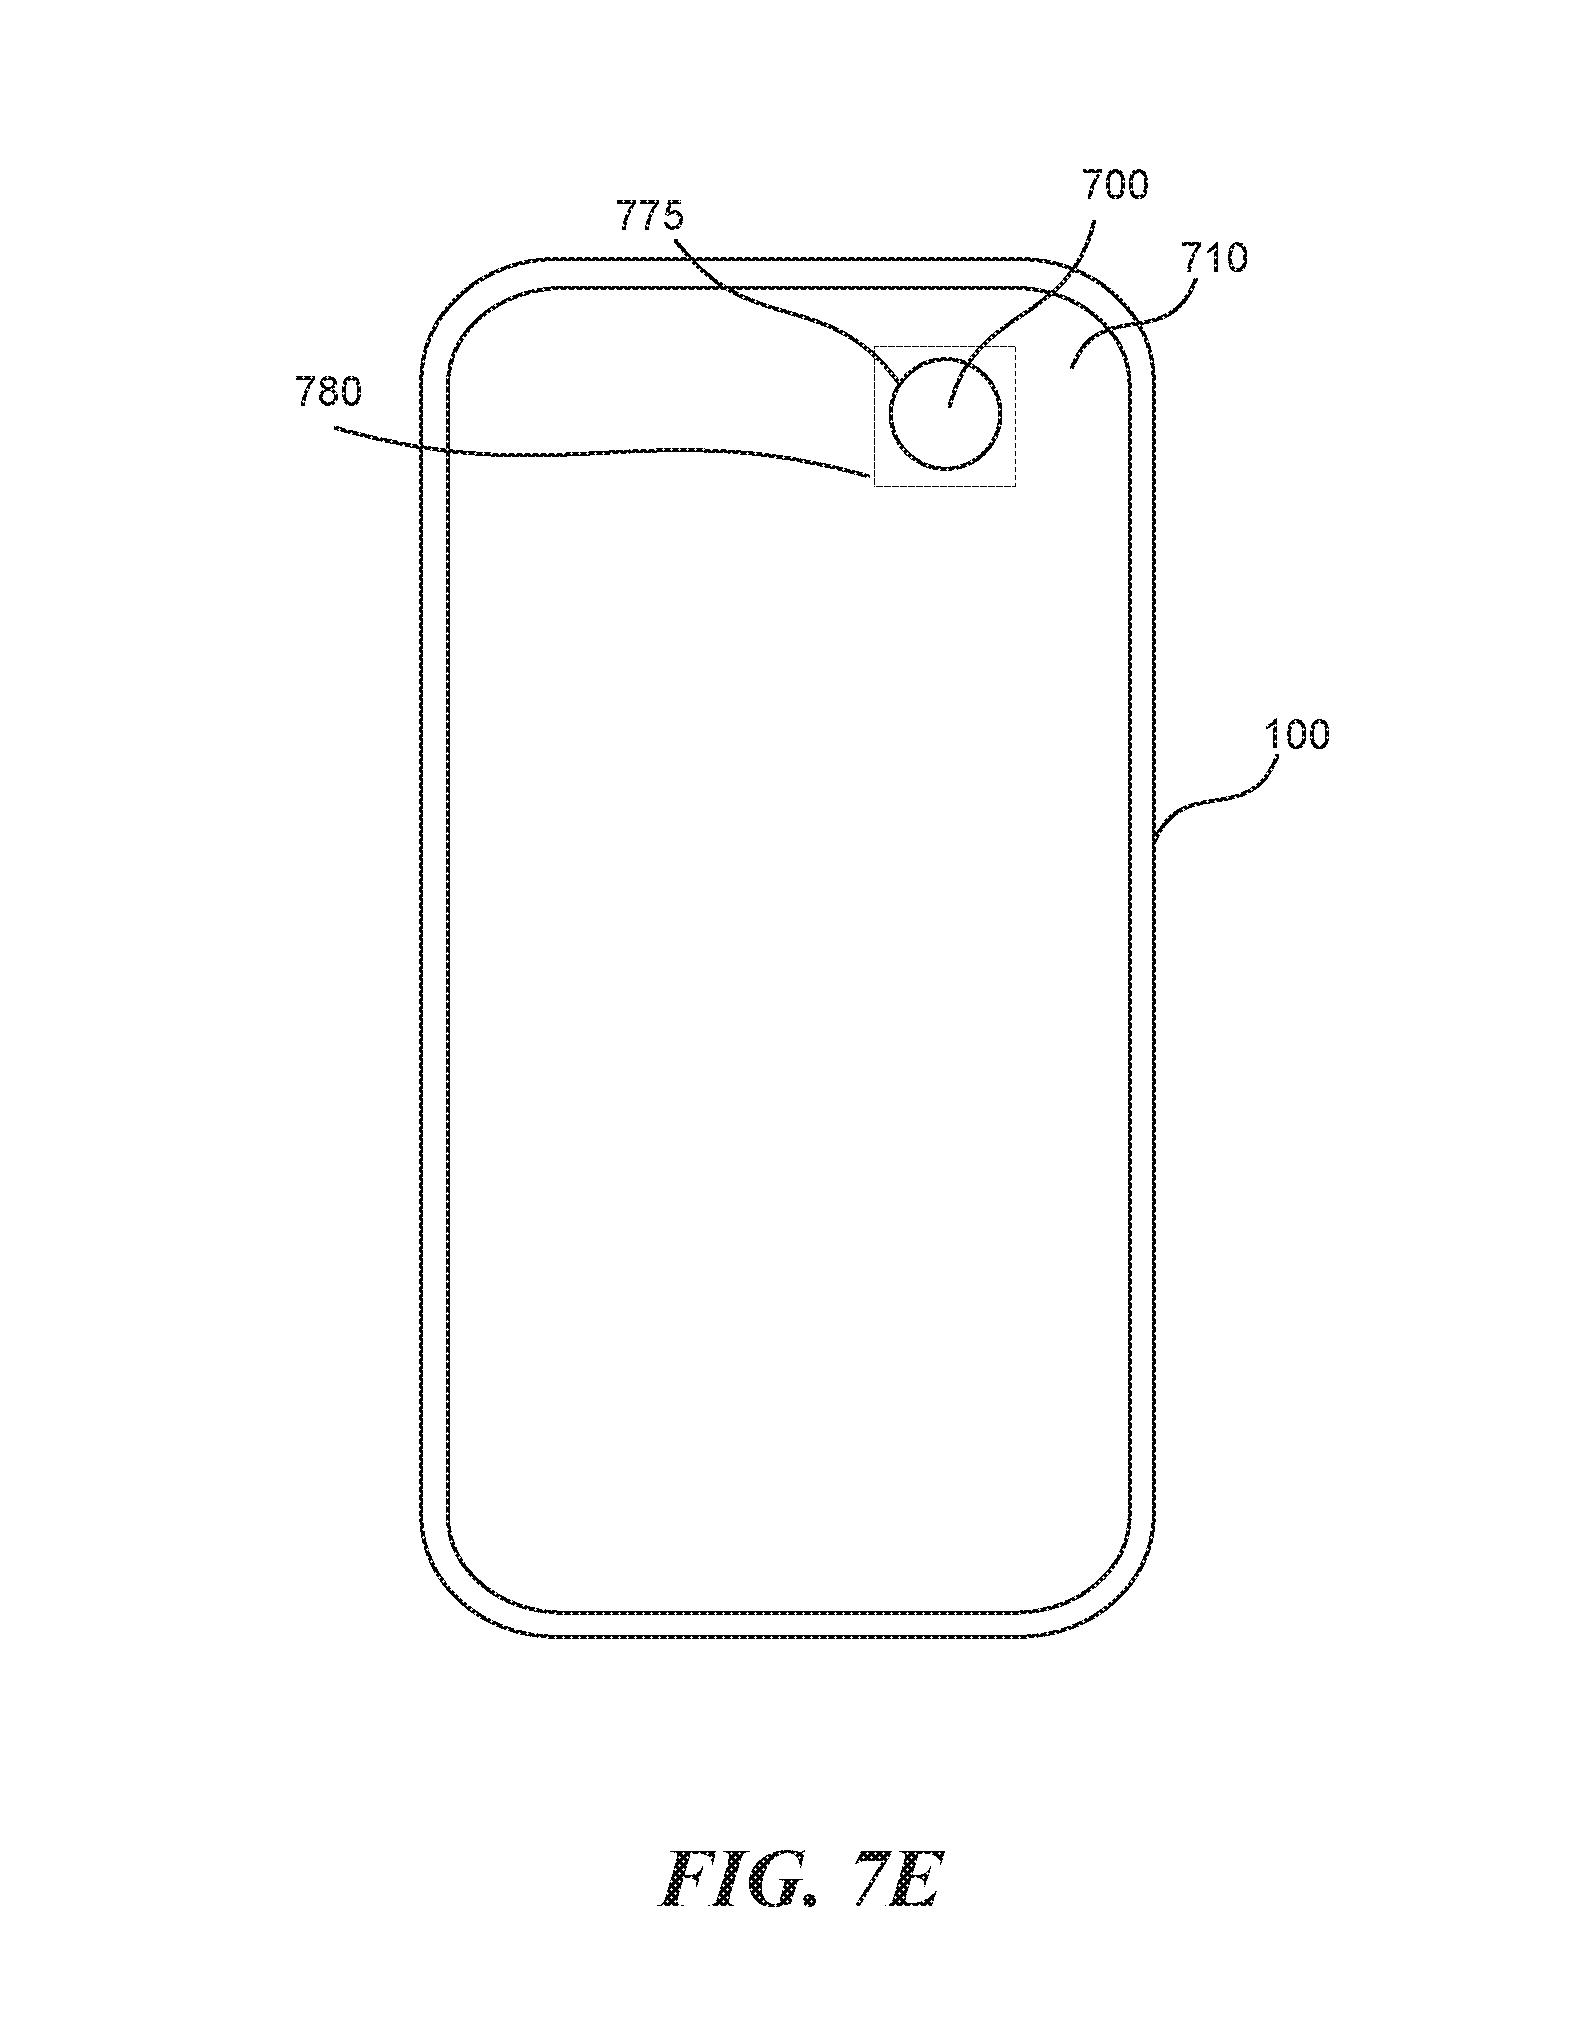 Essential Pop up Camera Patent 23